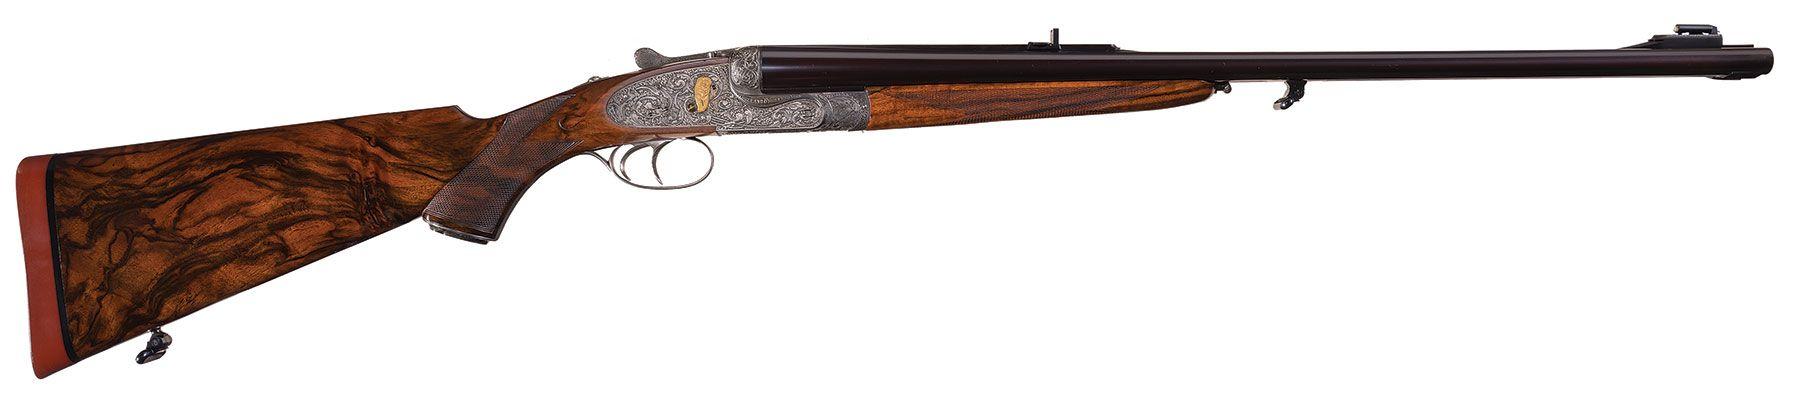 Holland & Holland 500/465 Nitro Express Double Rifle